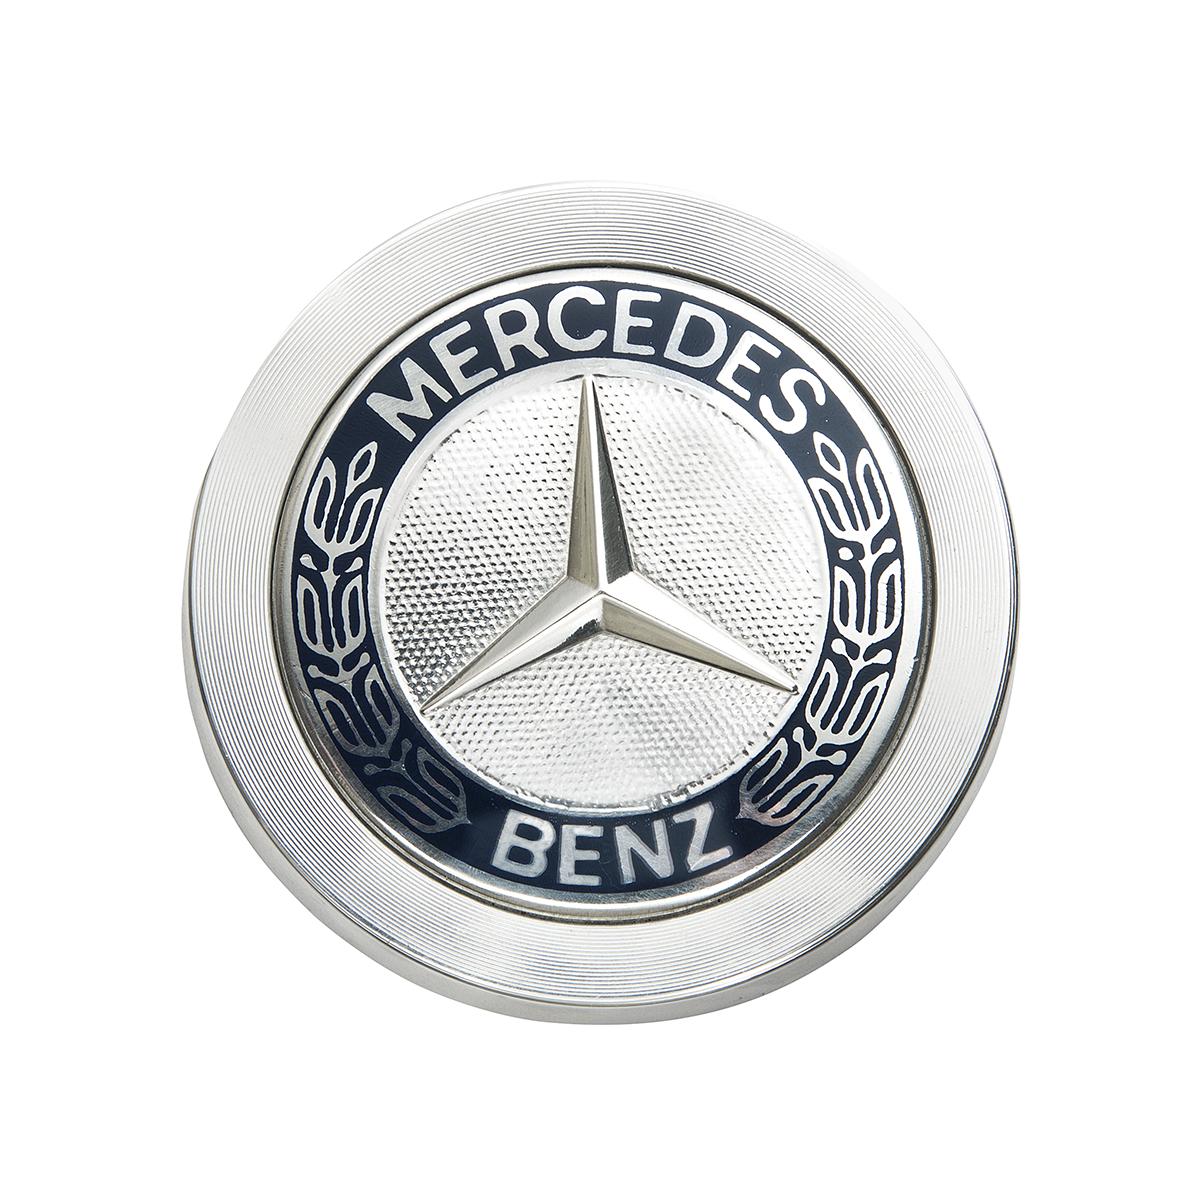 Custom Coin for Mercedes-Benz